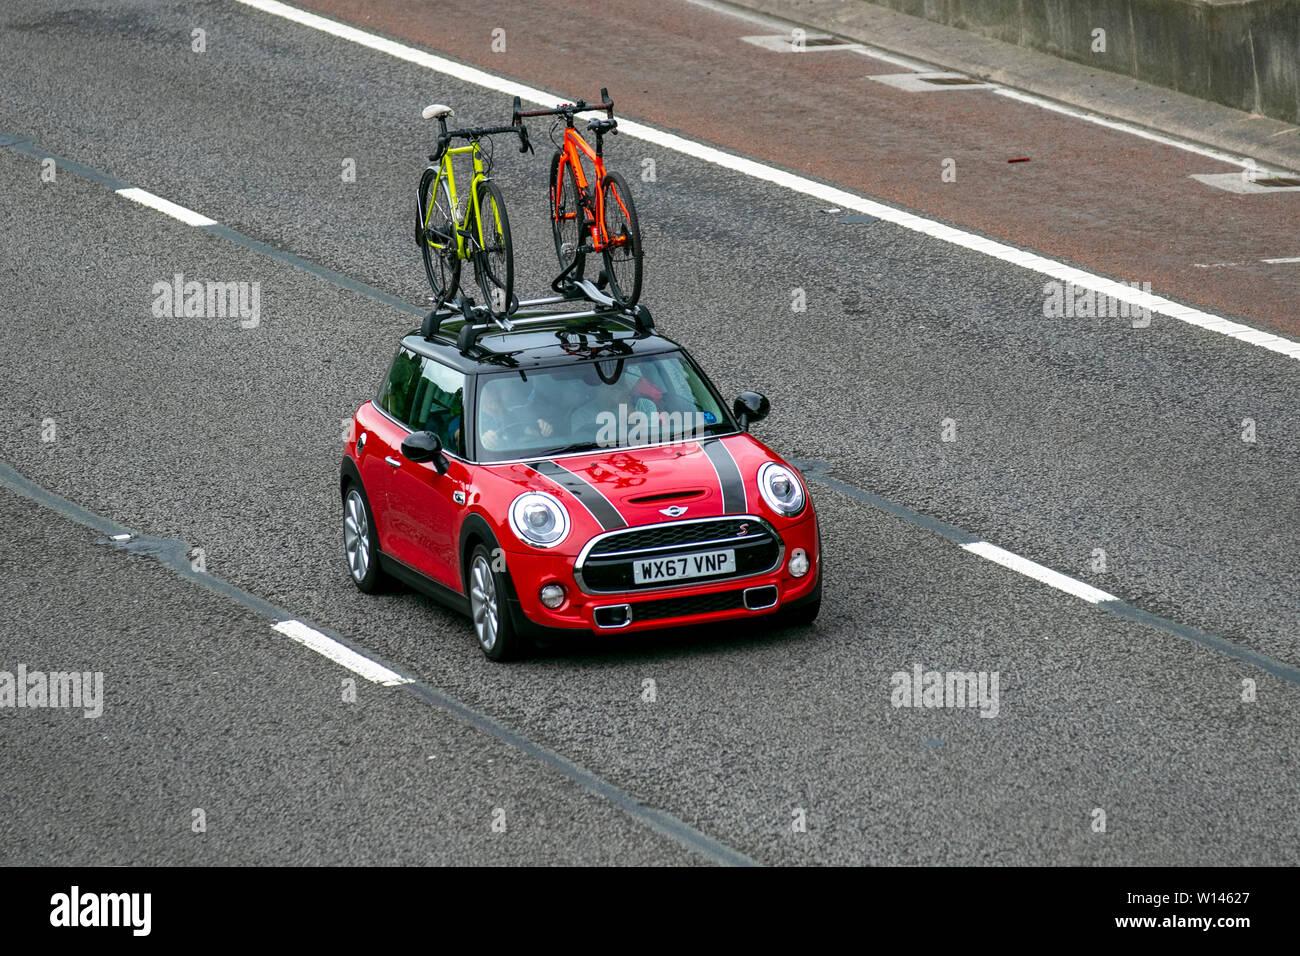 2017 Red Mini Cooper S M6 Lancaster Uk Vehicular Traffic Transport Modern Saloon Cars Roof Rack